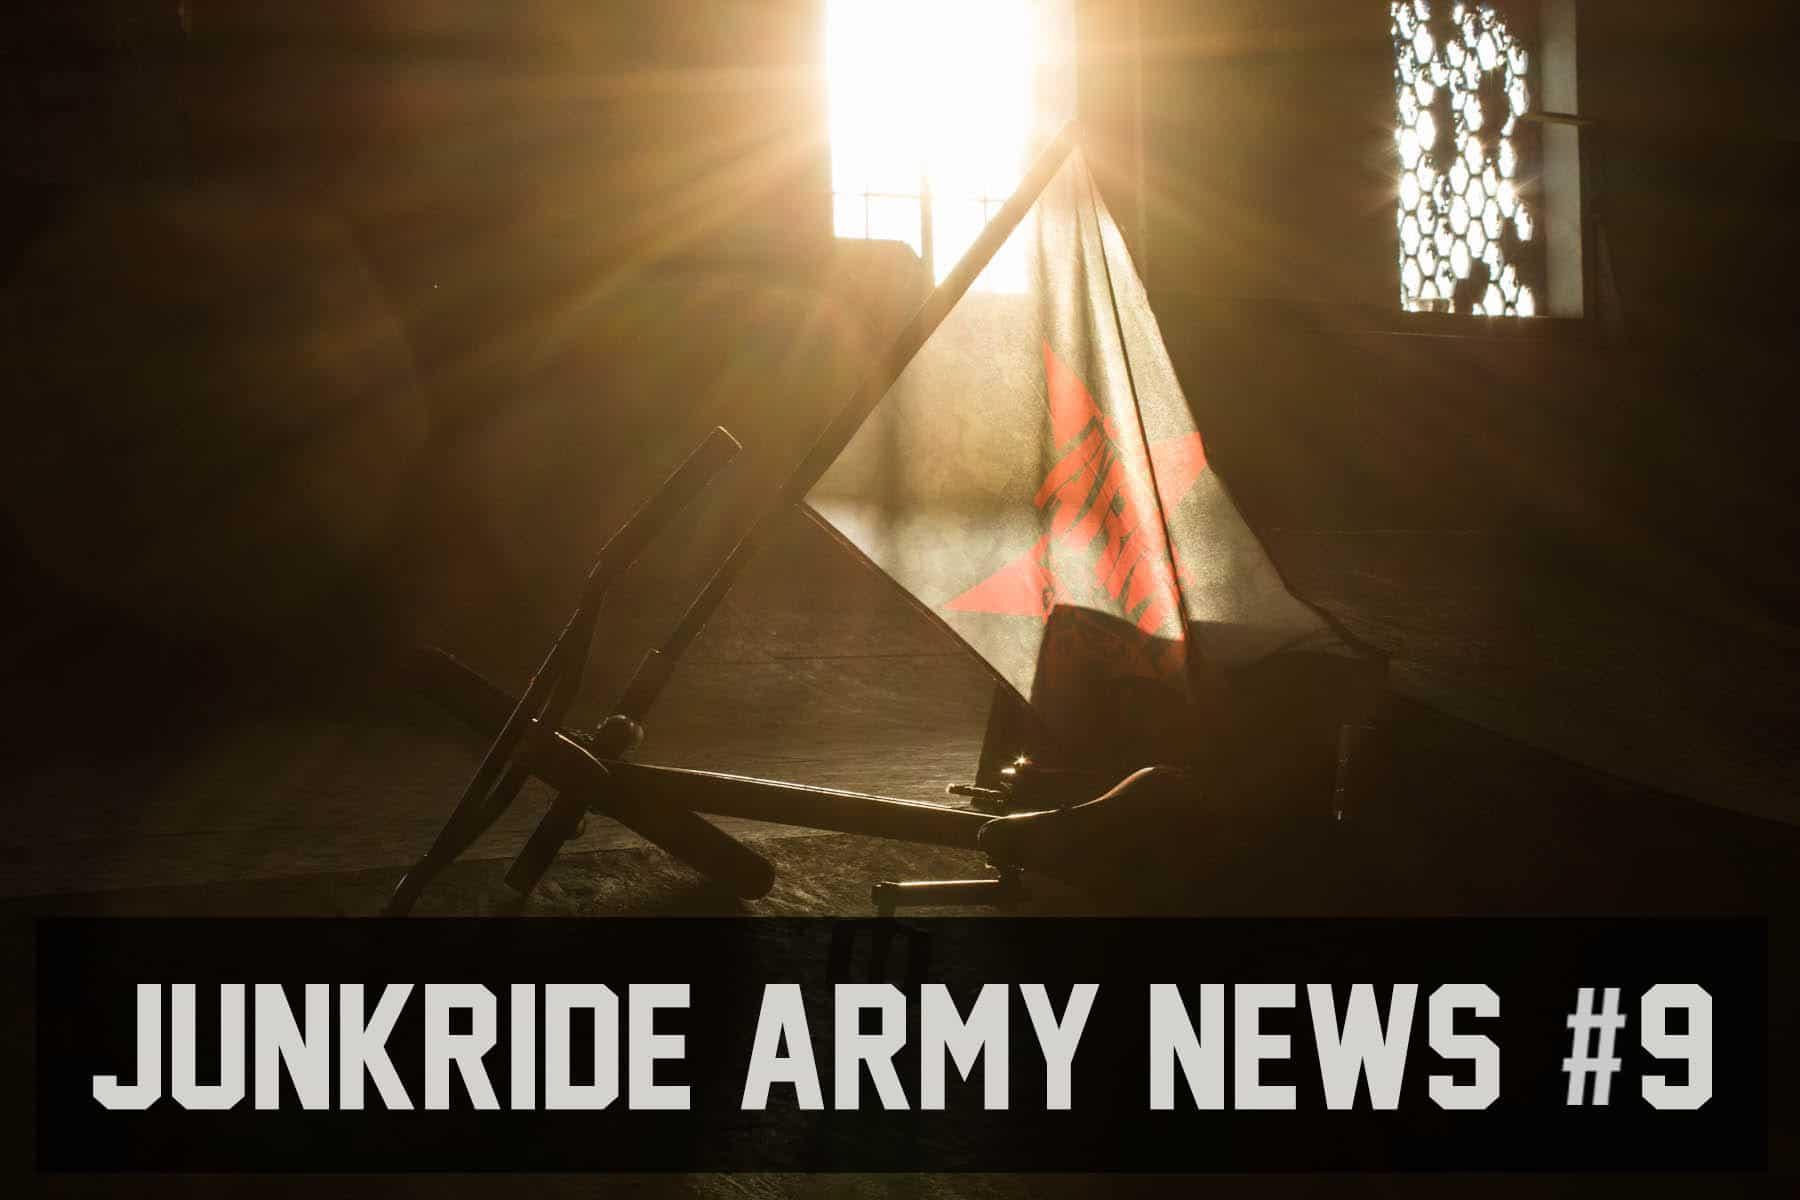 junk army news 9